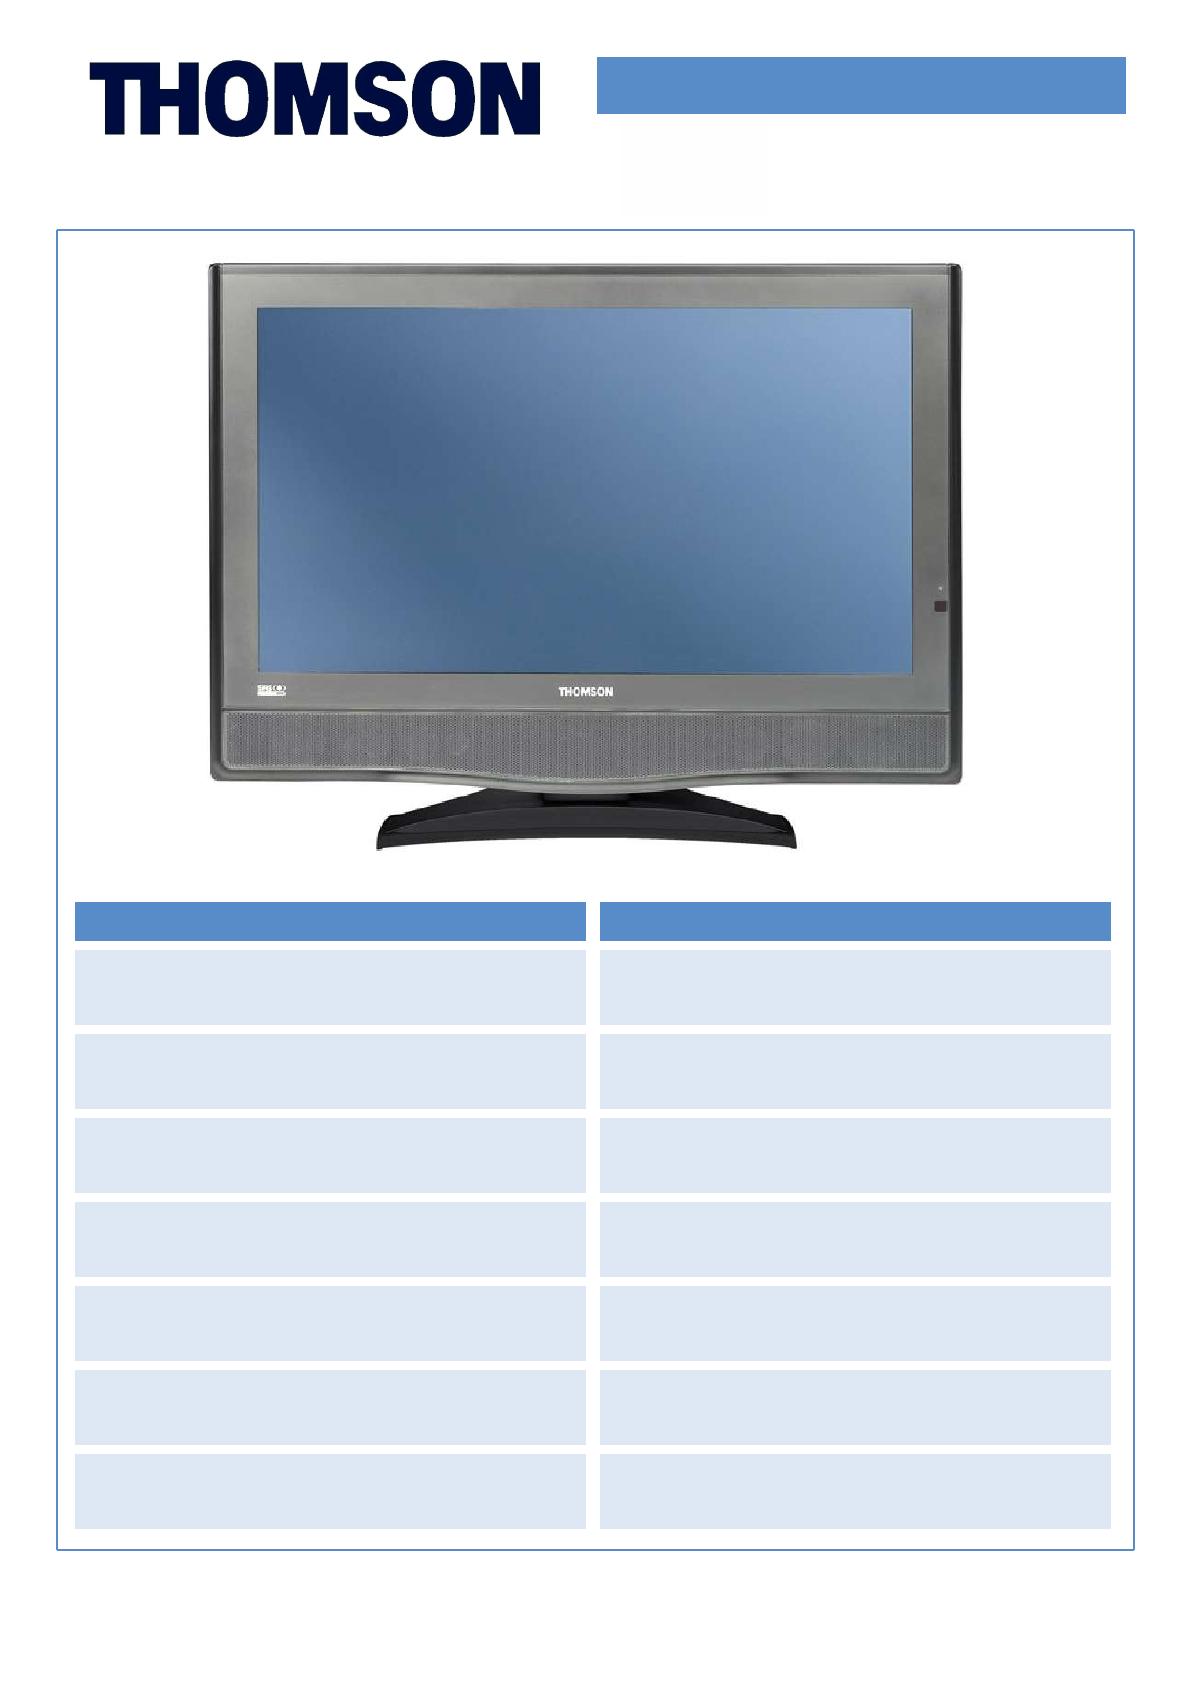 Technicolor Thomson 32Lb030B5 Users Manual